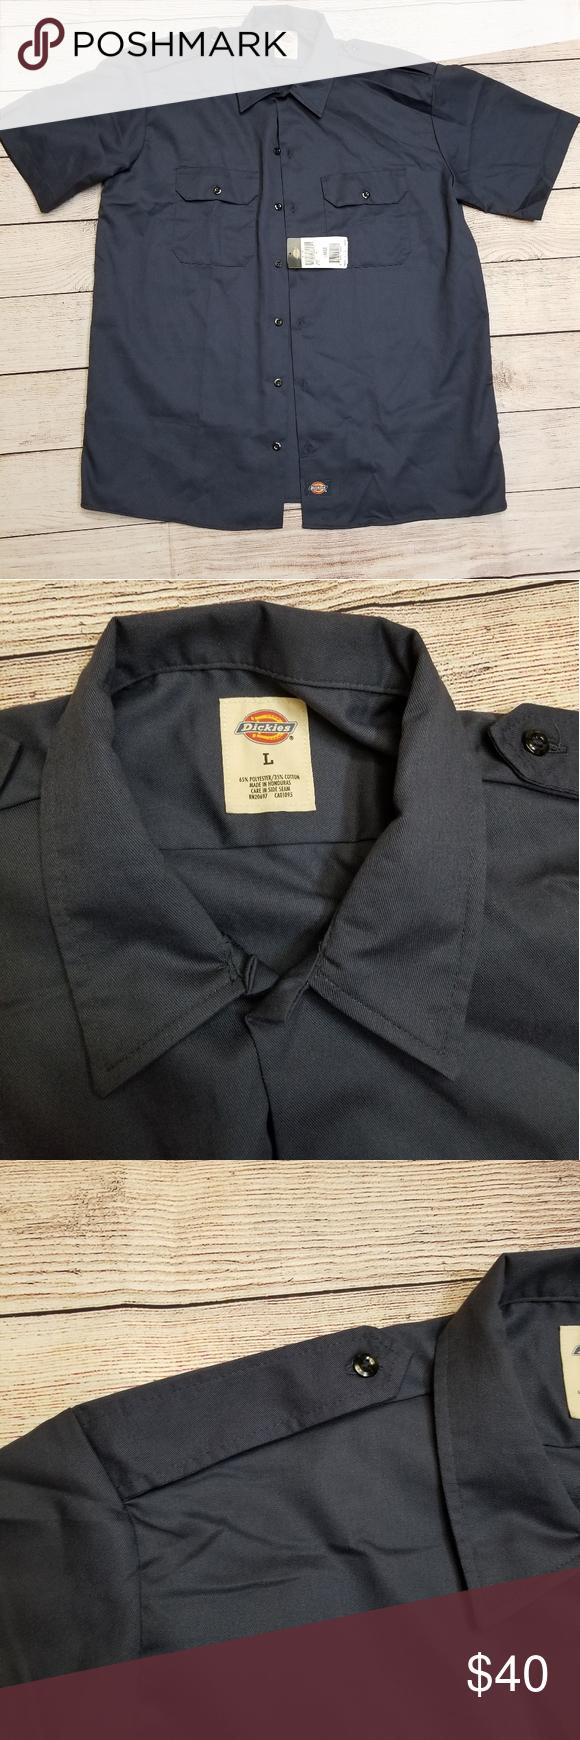 Dickies Work Shirt Vintage Nwt In 2020 Work Shirts Mens Shirt Dress Dickies